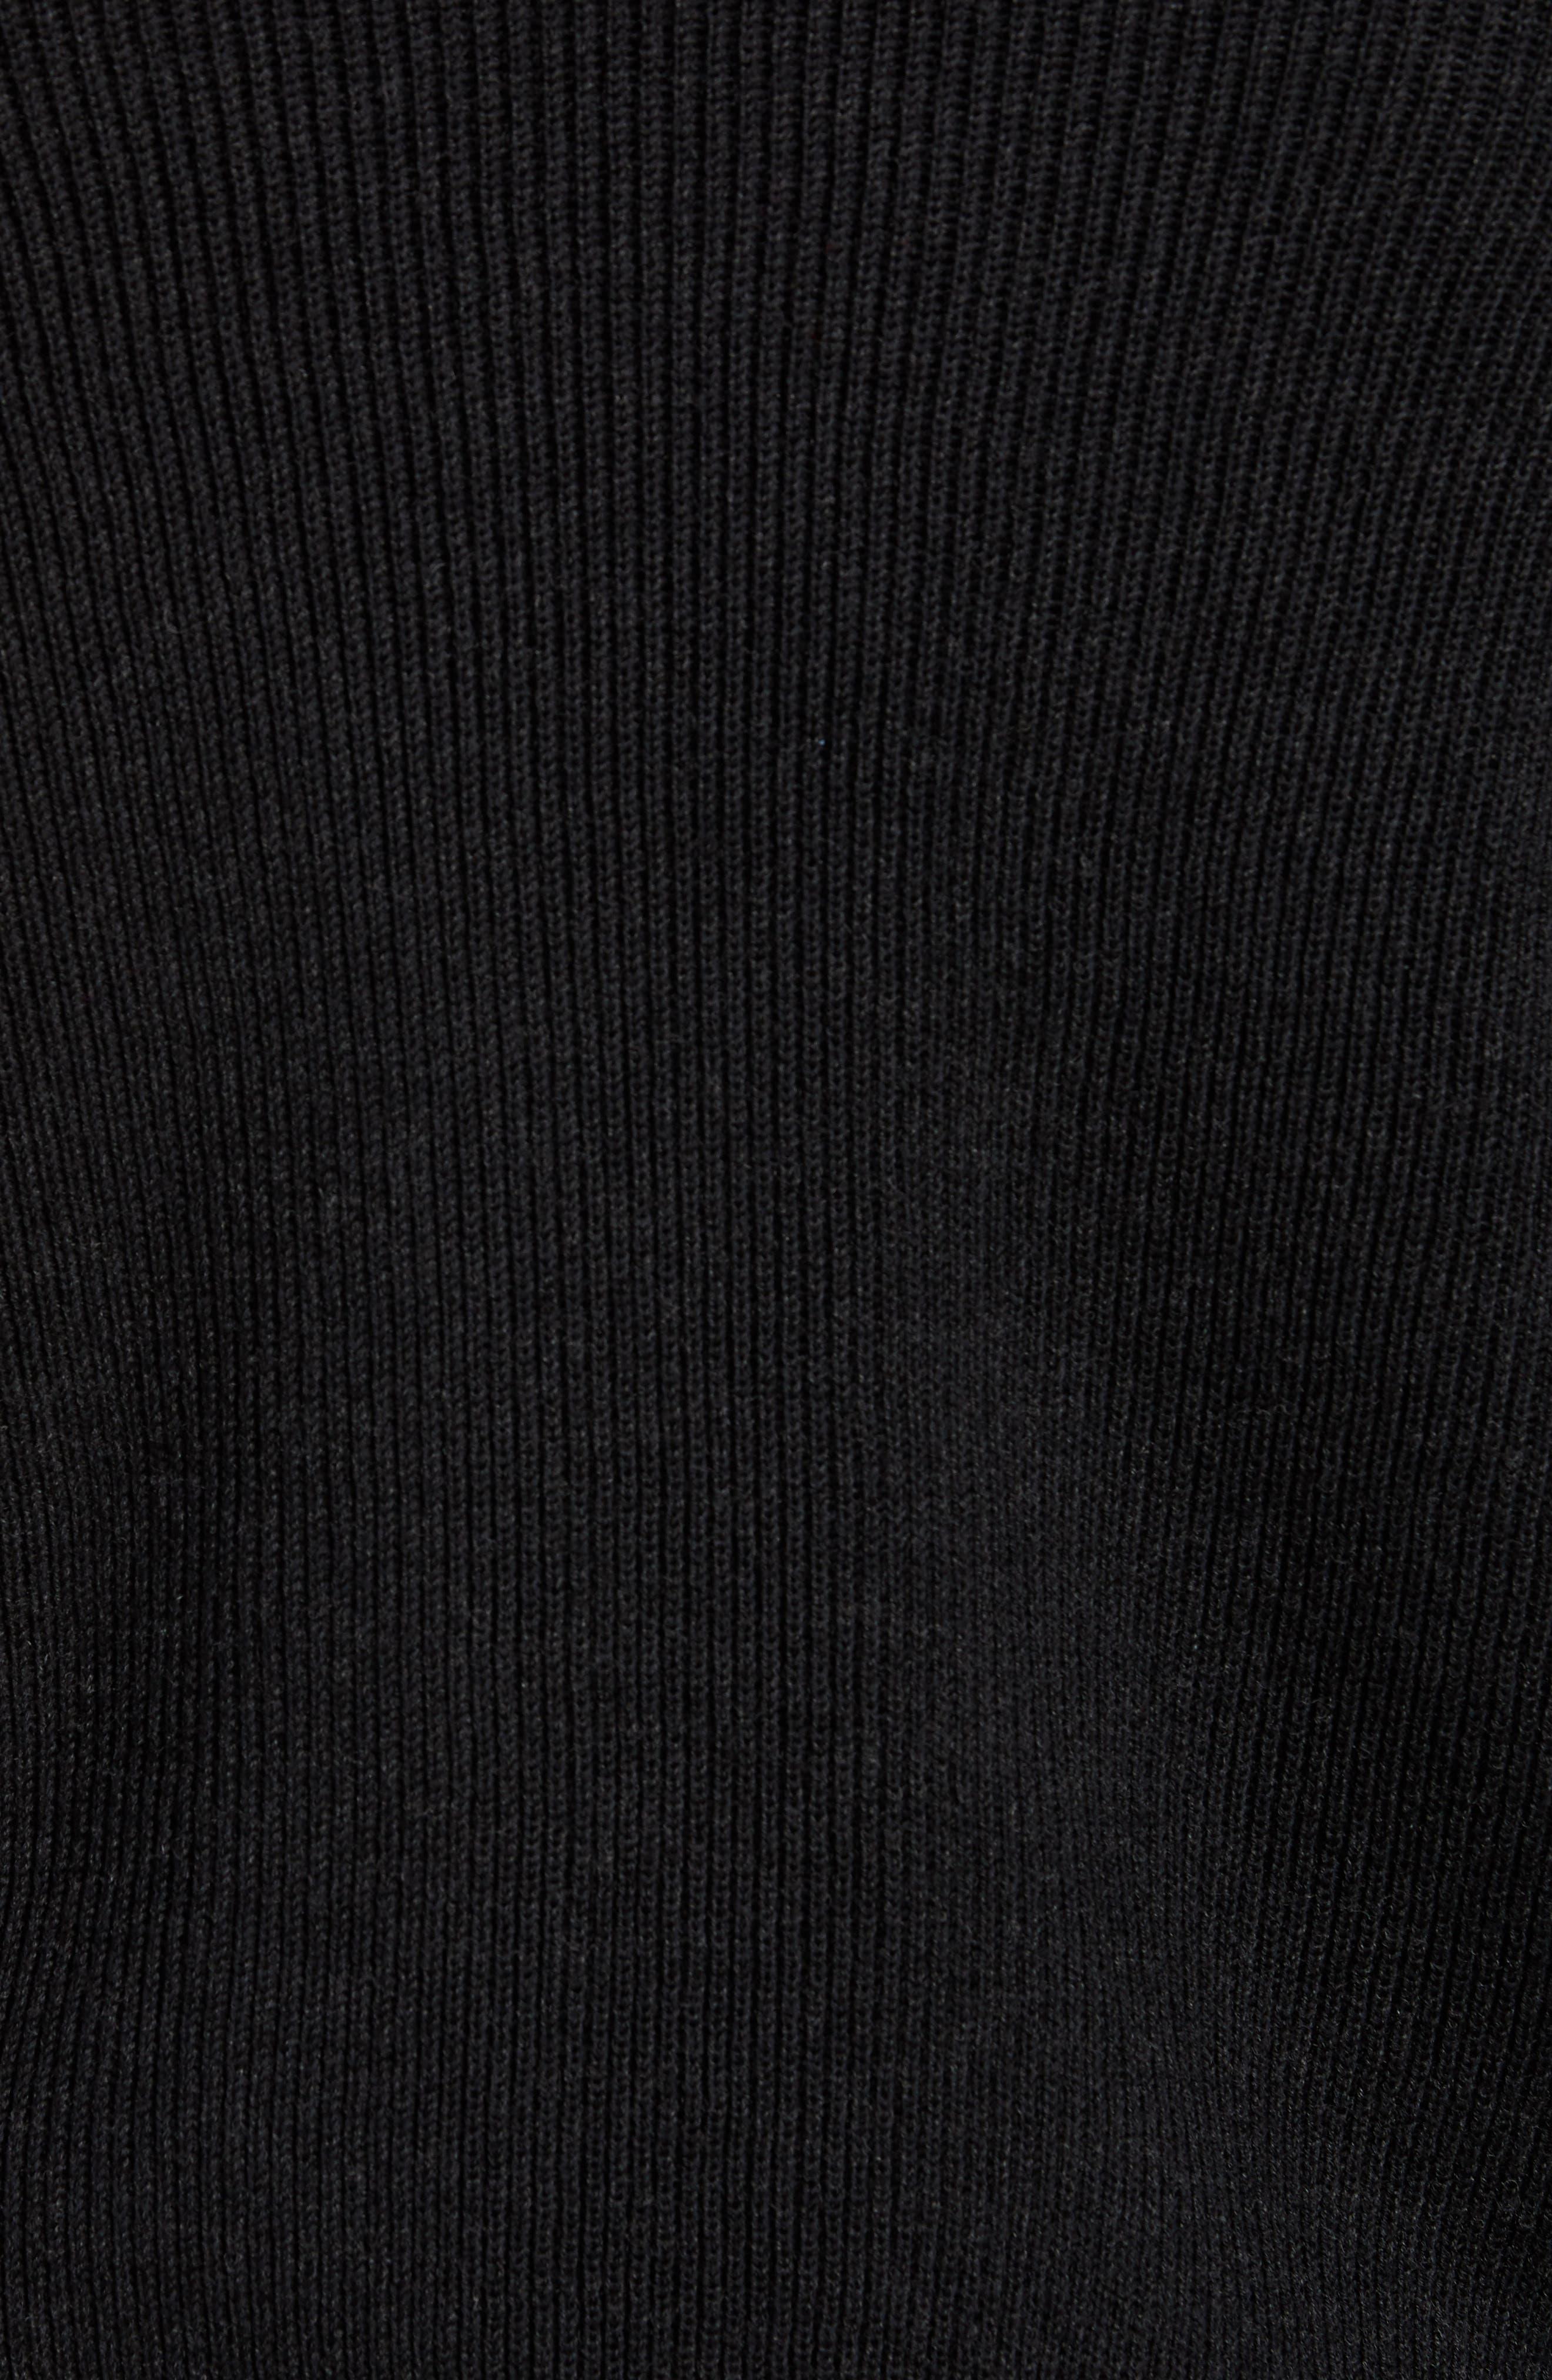 RAG & BONE, Andrew Zip Front Merino Wool Sweater, Alternate thumbnail 5, color, BLACK HEATHER